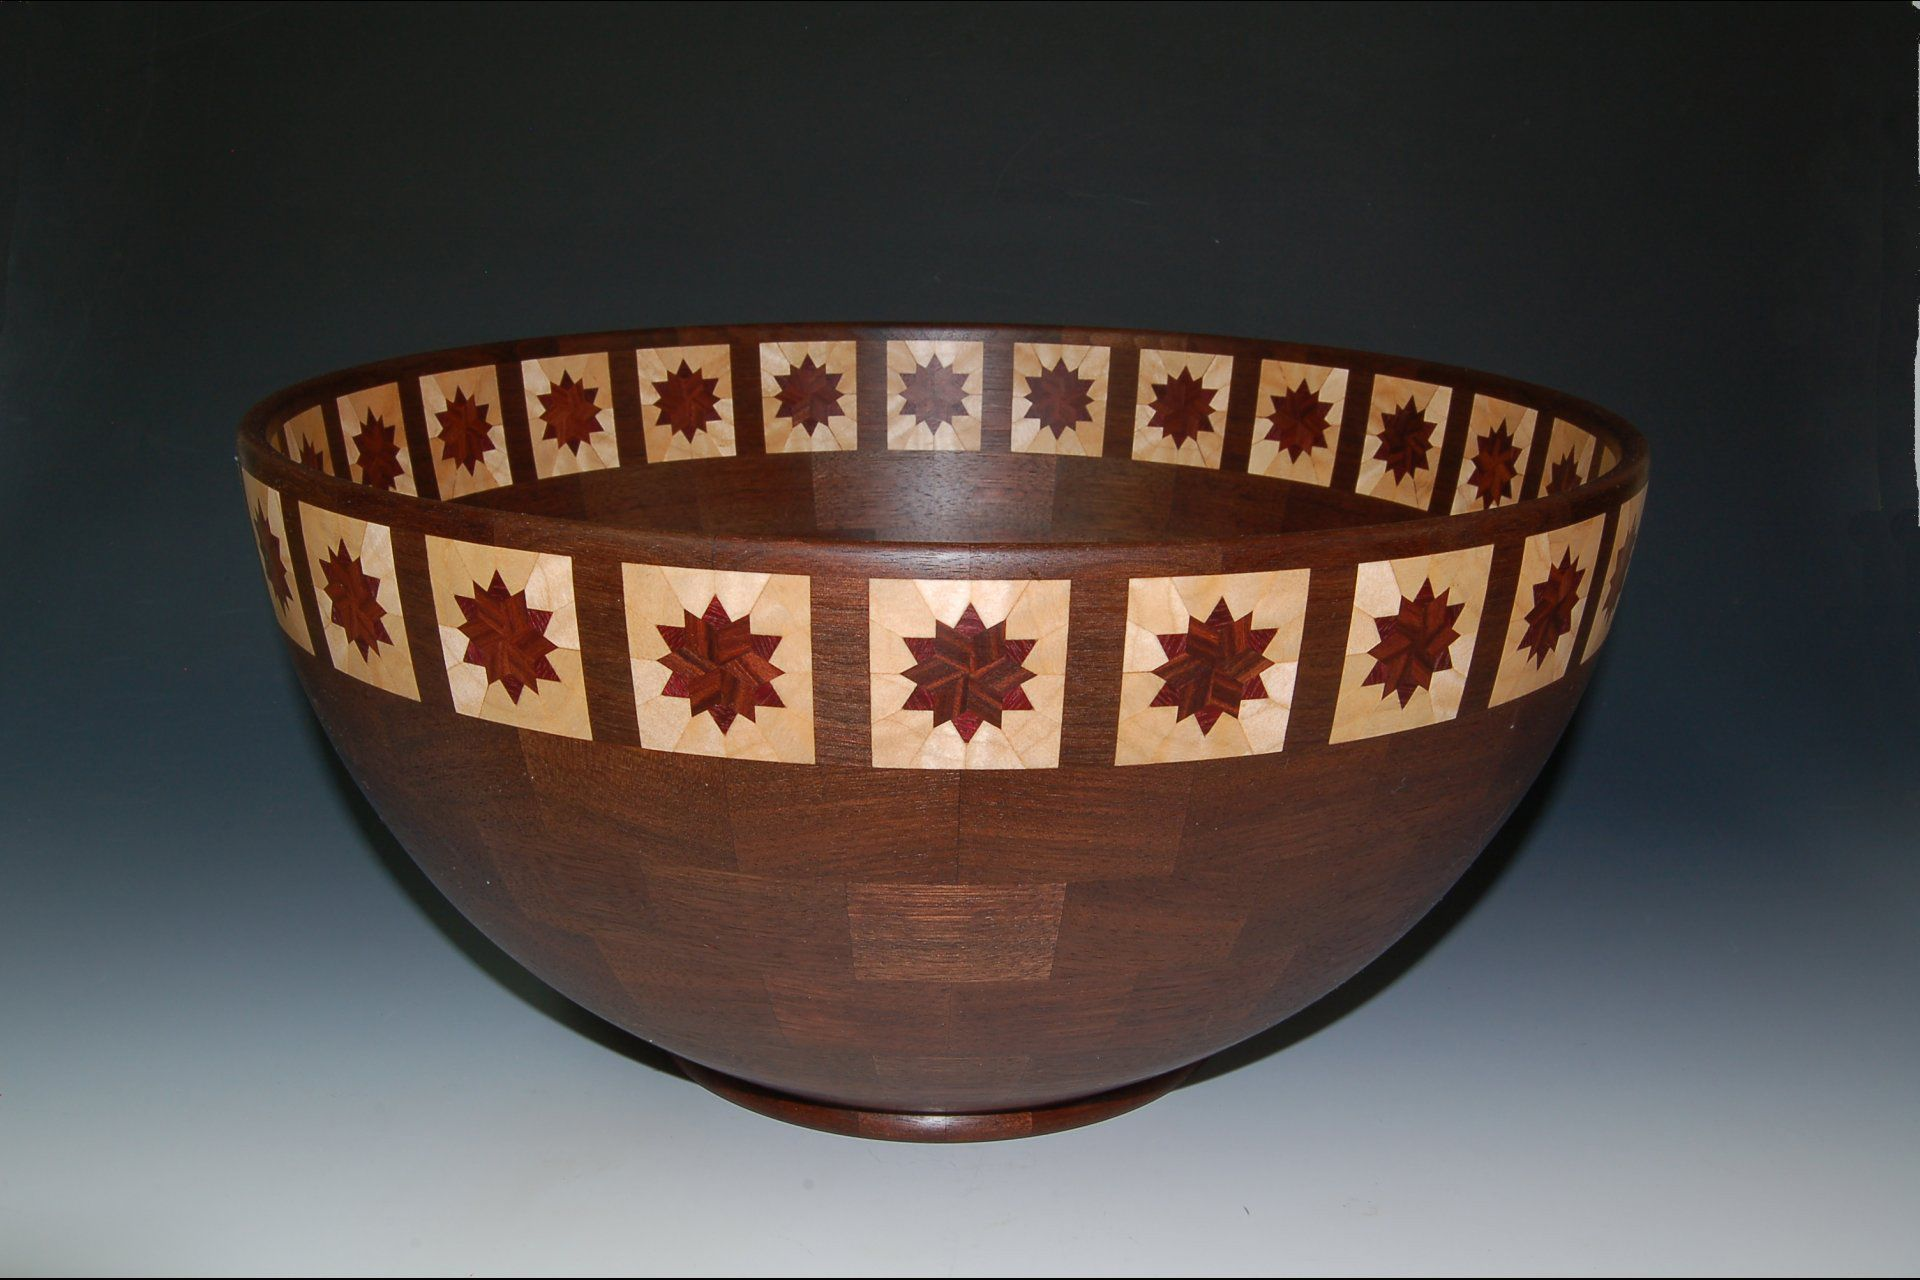 Tim Niewiadomski Artistic designs, Bud vases, Decorative